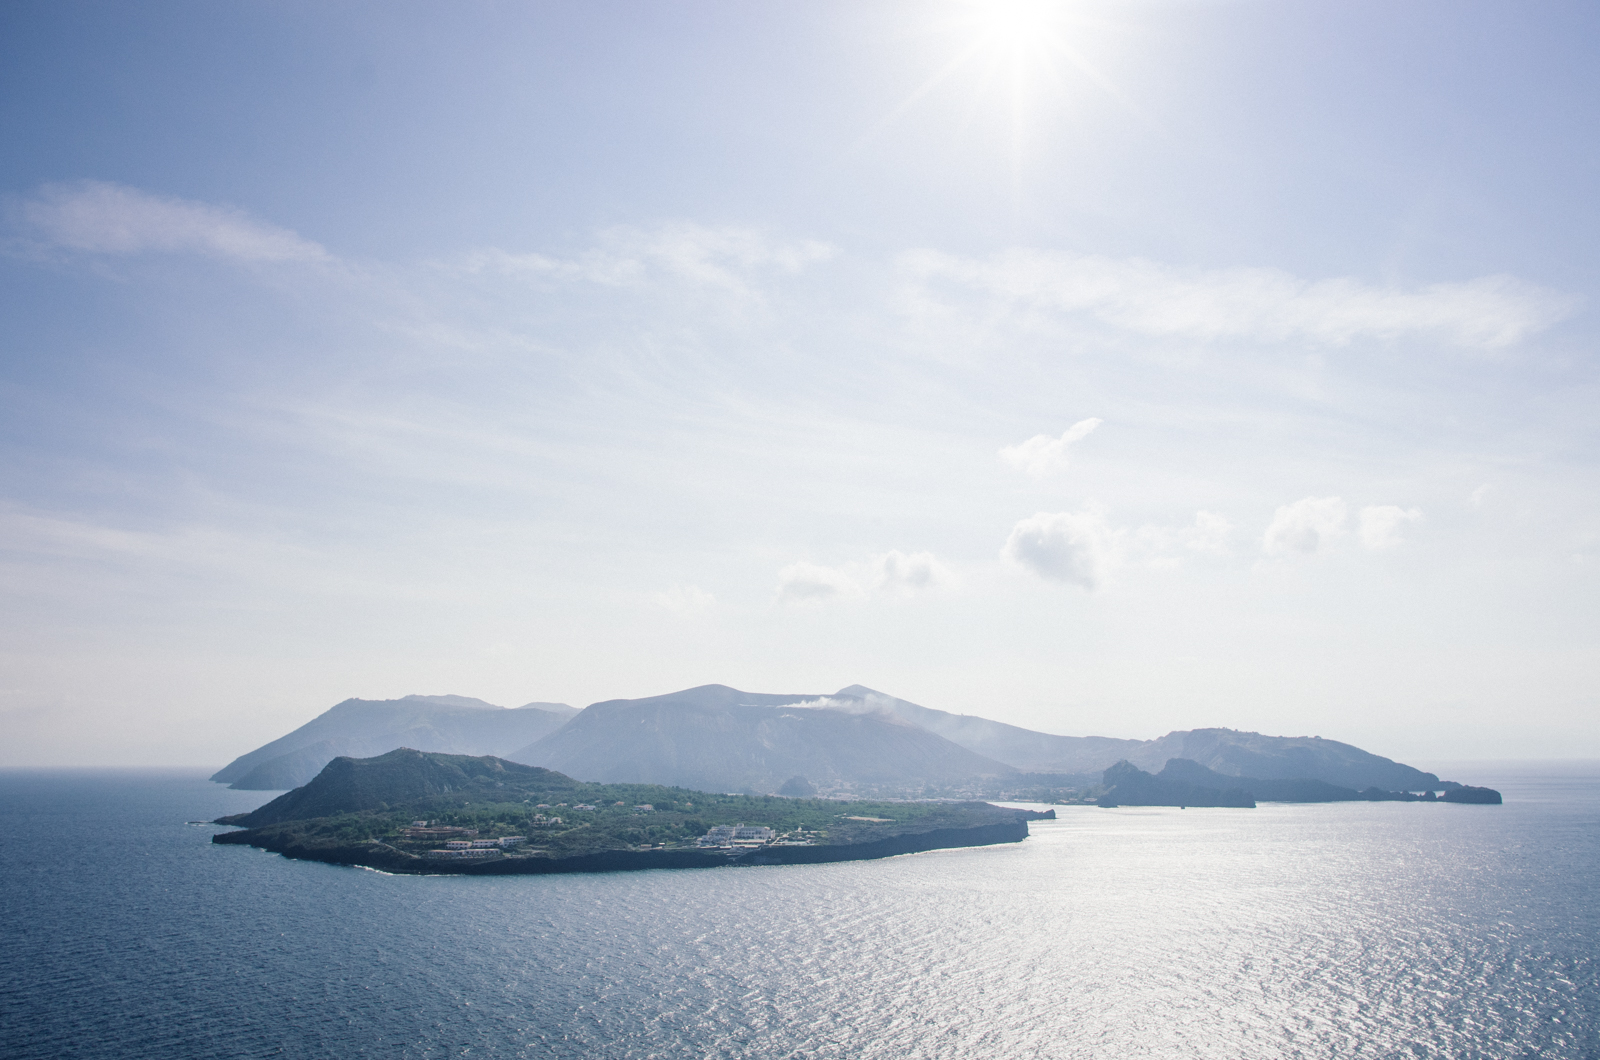 Panorama sur Vulcano - Lipari - îles éoliennes